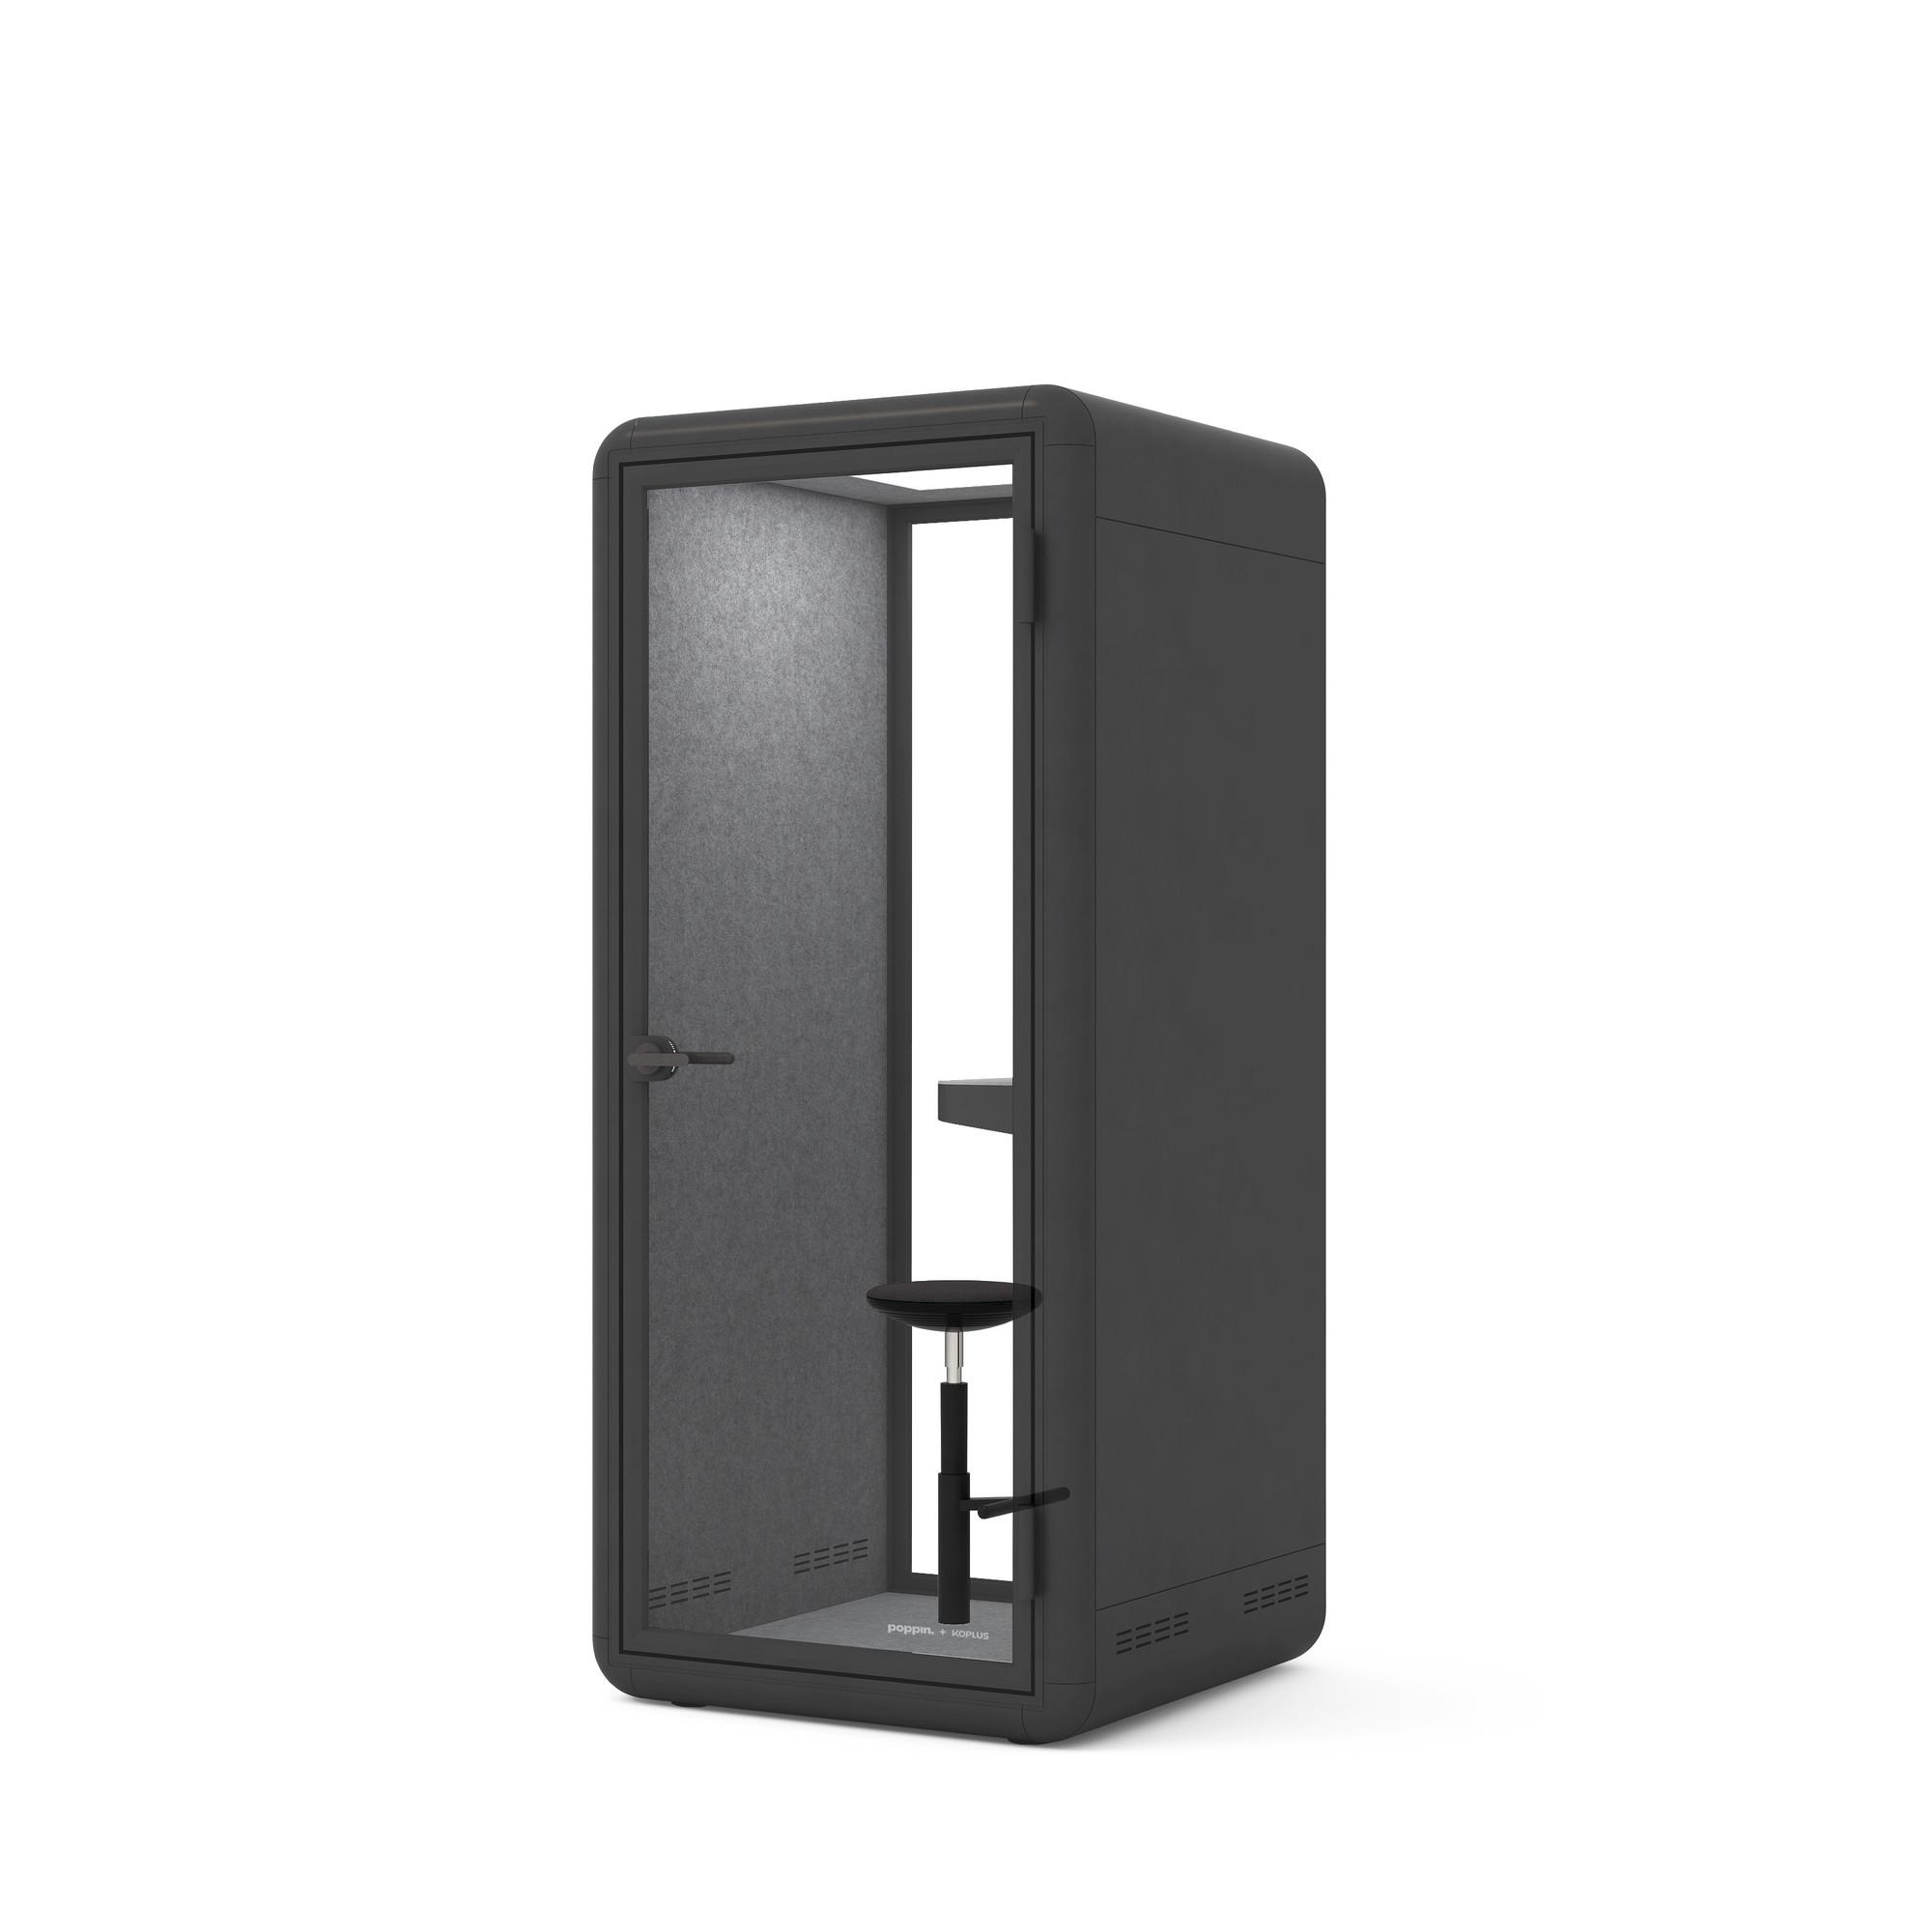 Groovy Black Poppinpod Kolo 1 With Stool Modern Office Phone Booth Poppin Frankydiablos Diy Chair Ideas Frankydiabloscom